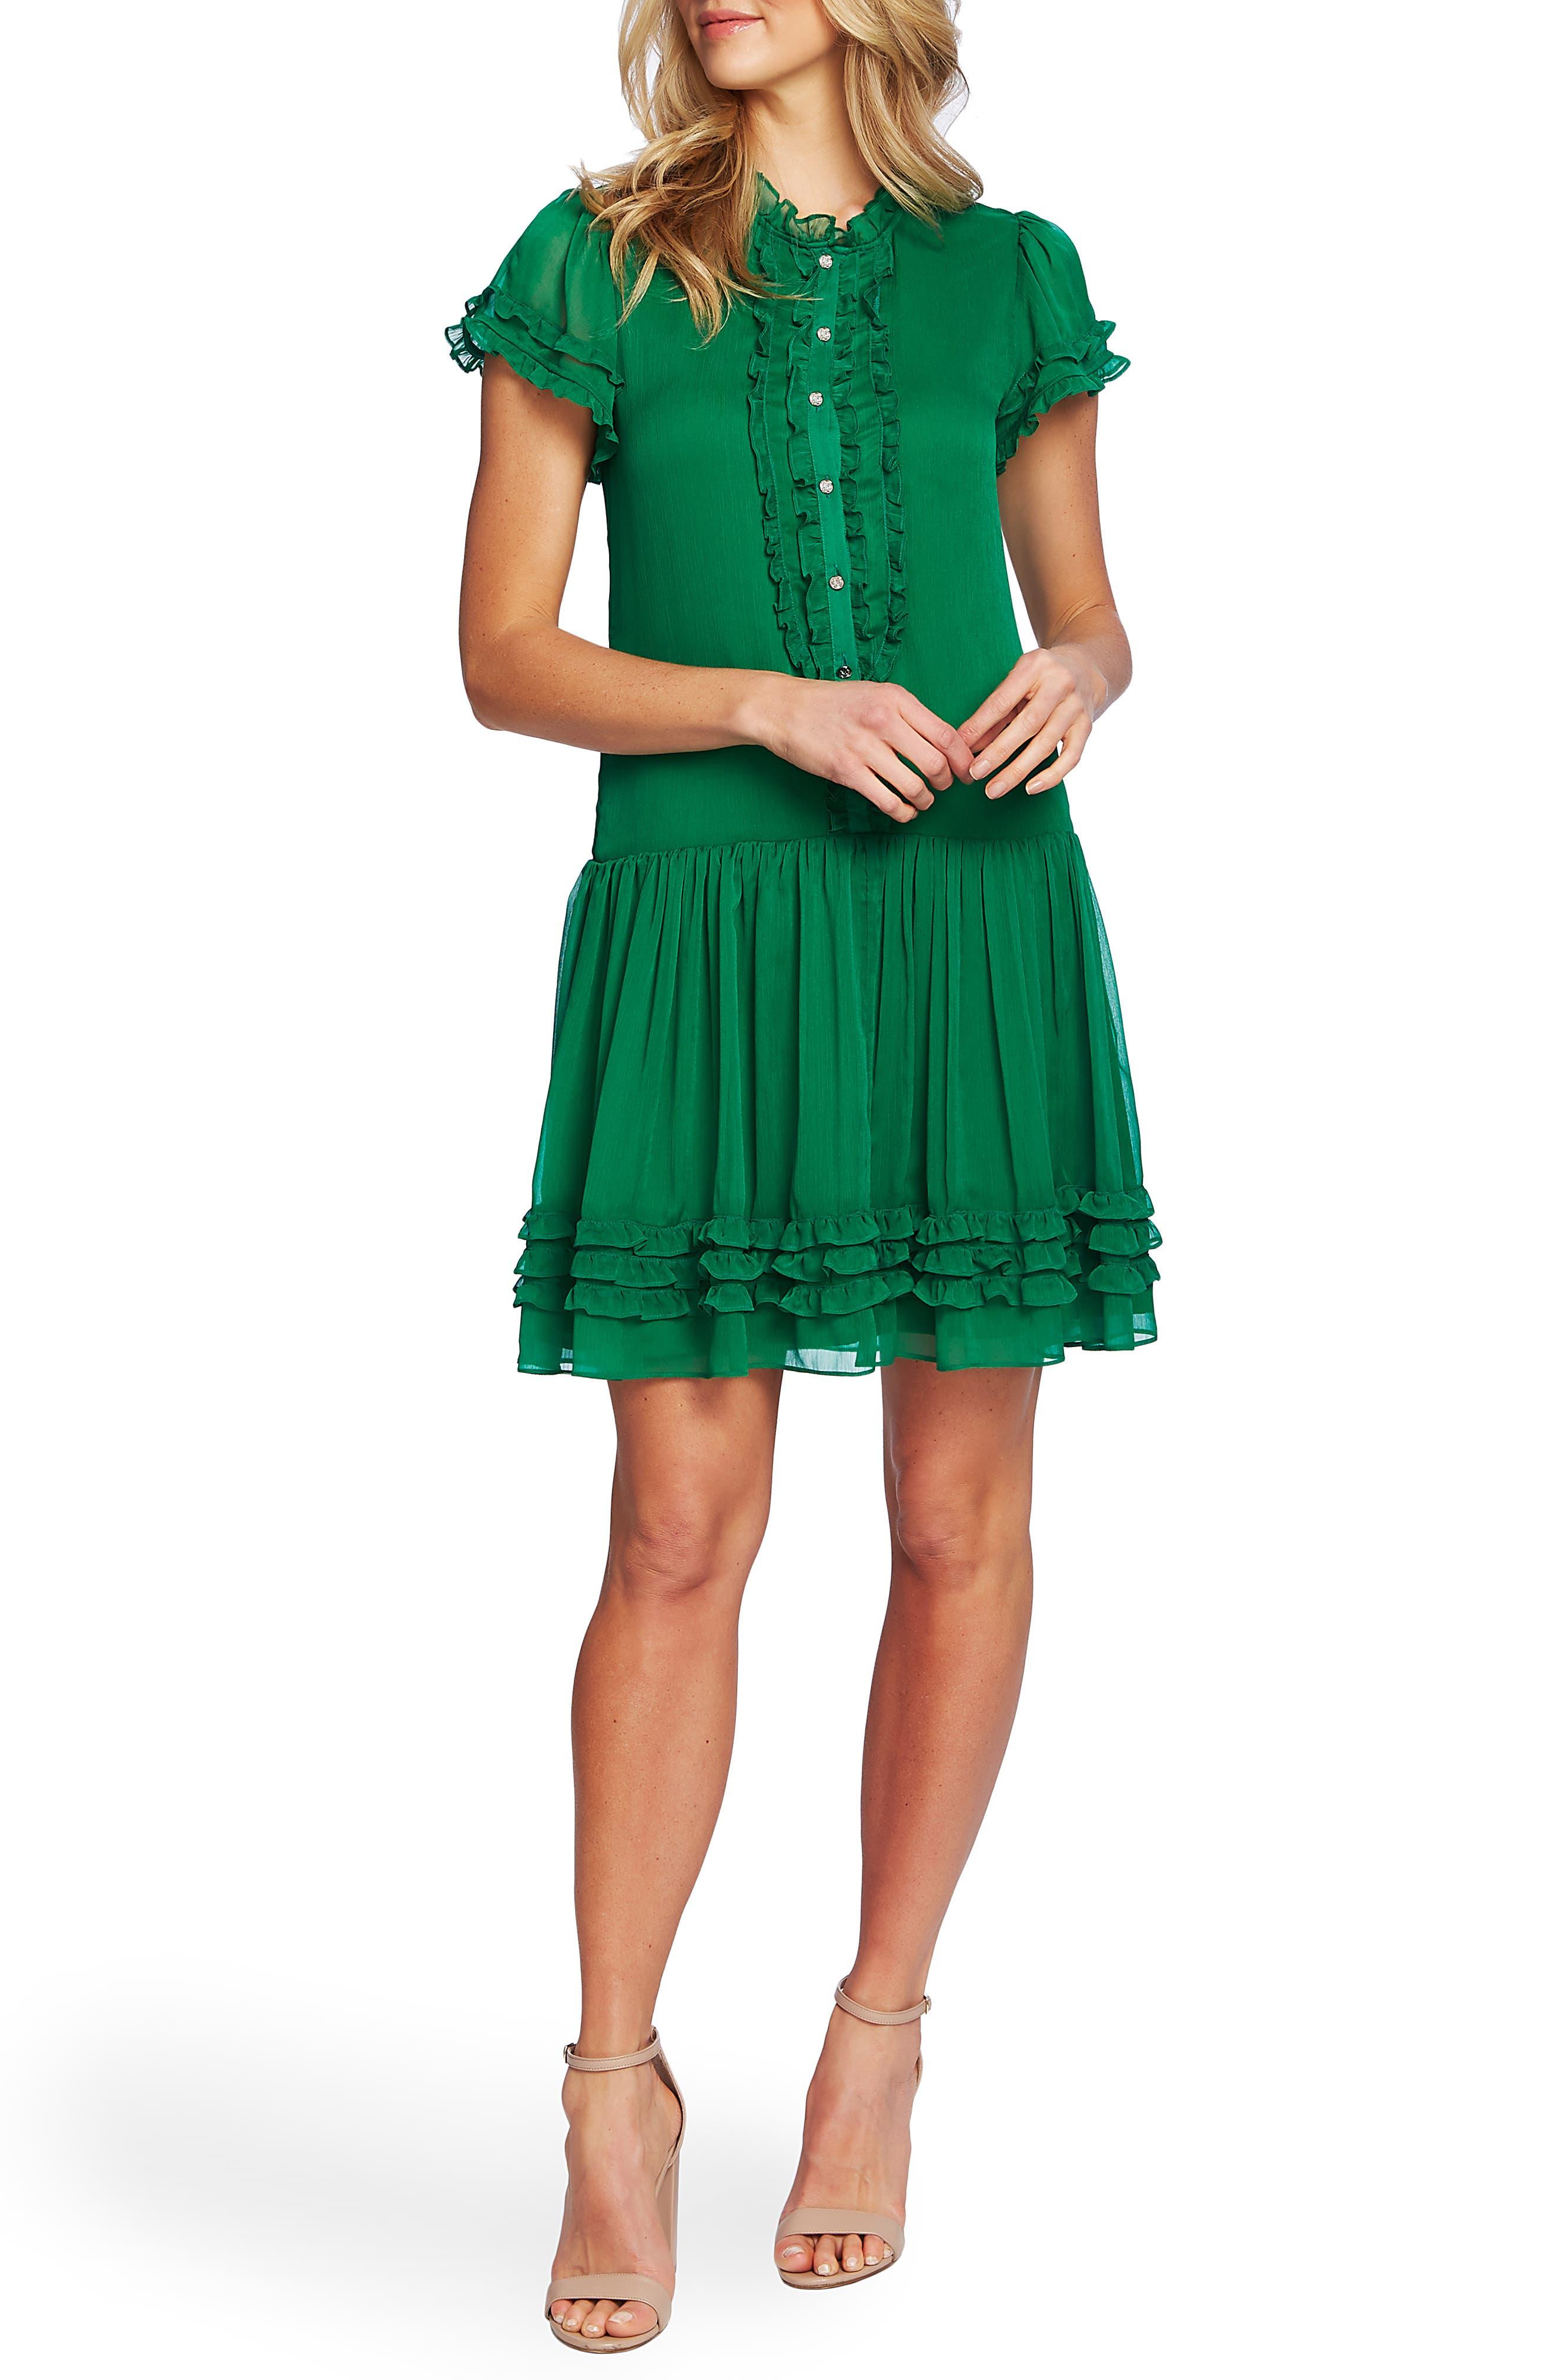 1920s Day Dresses, Tea Dresses, Mature Dresses with Sleeves Womens Cece Ruffle Detail Drop Waist Dress Size Large - Green $139.00 AT vintagedancer.com